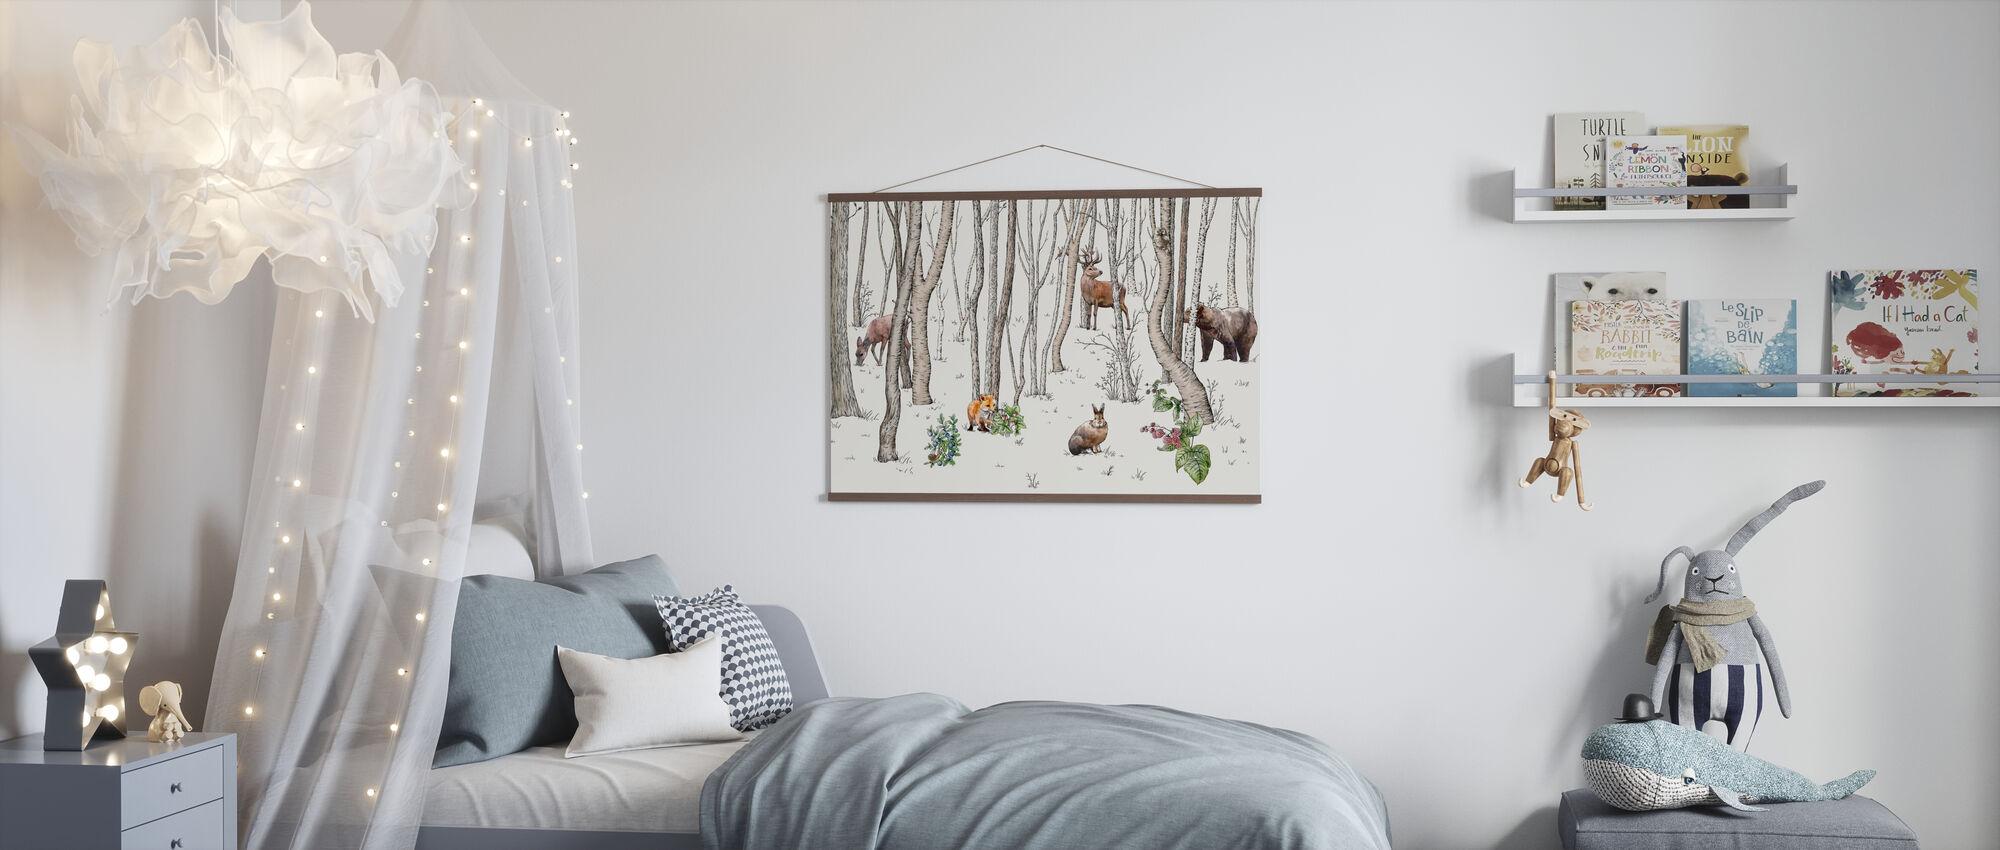 Skogens dyr - Plakat - Barnerom